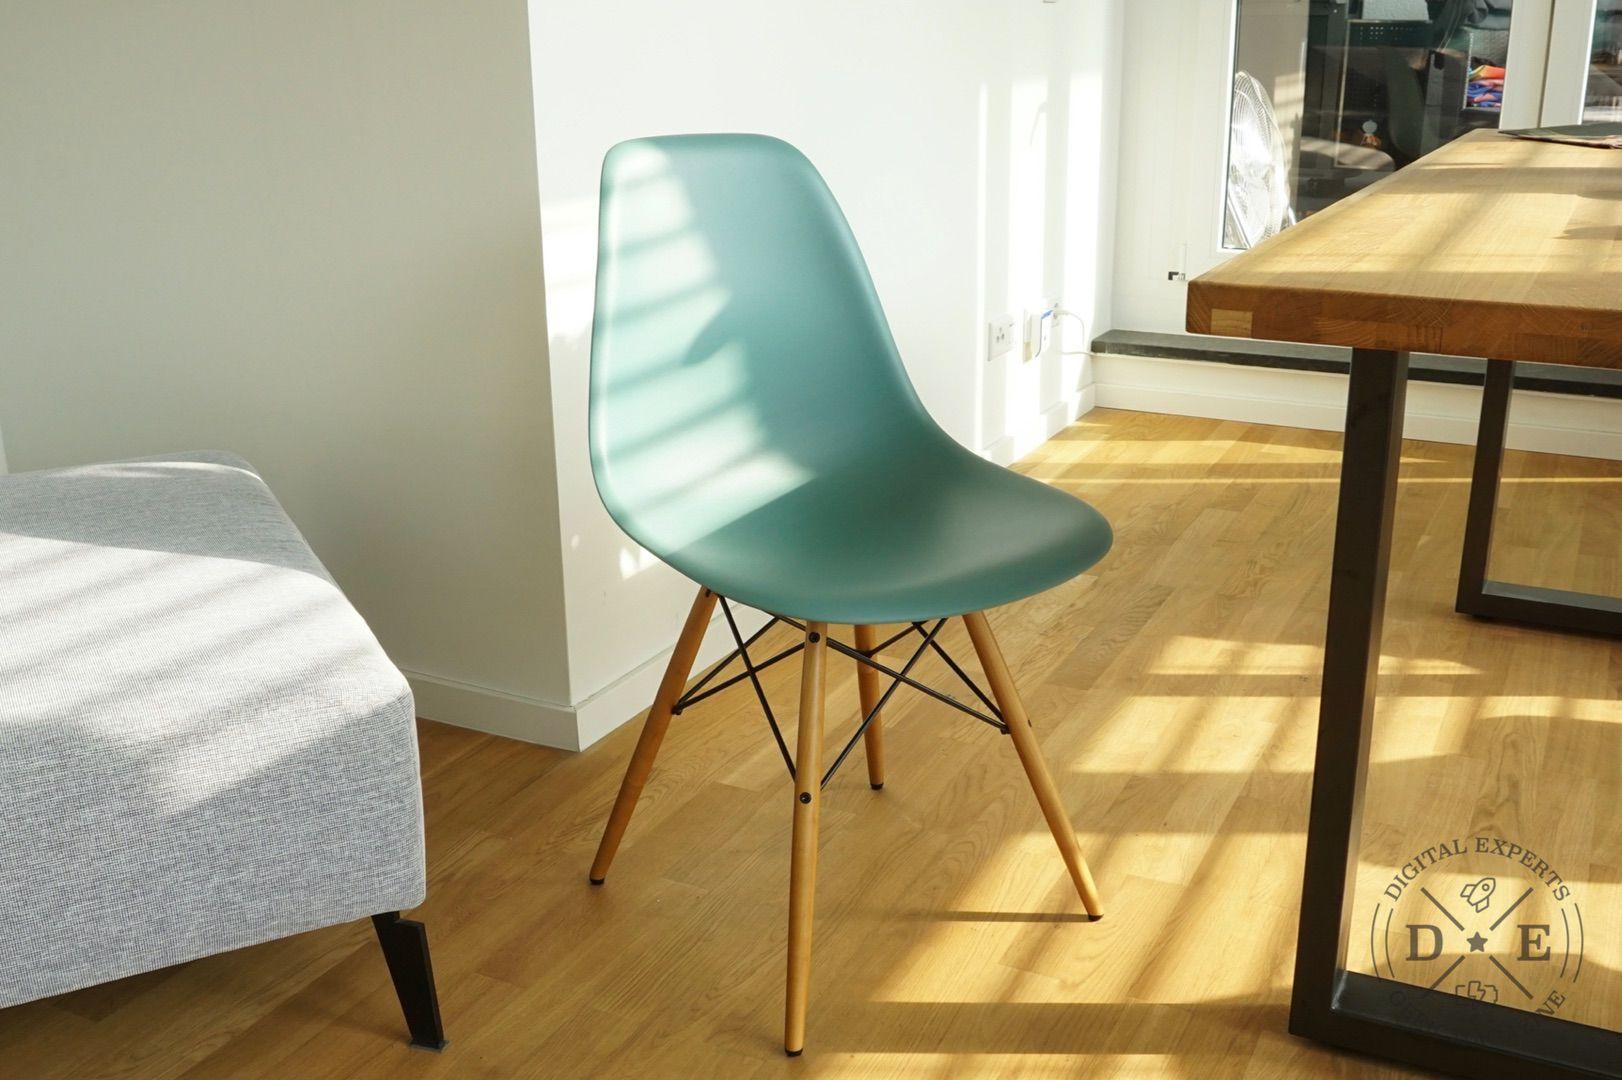 Eames Stuhl Gunstig Kaufen Vitra Eames Plastic Armchair Rar Ahorn